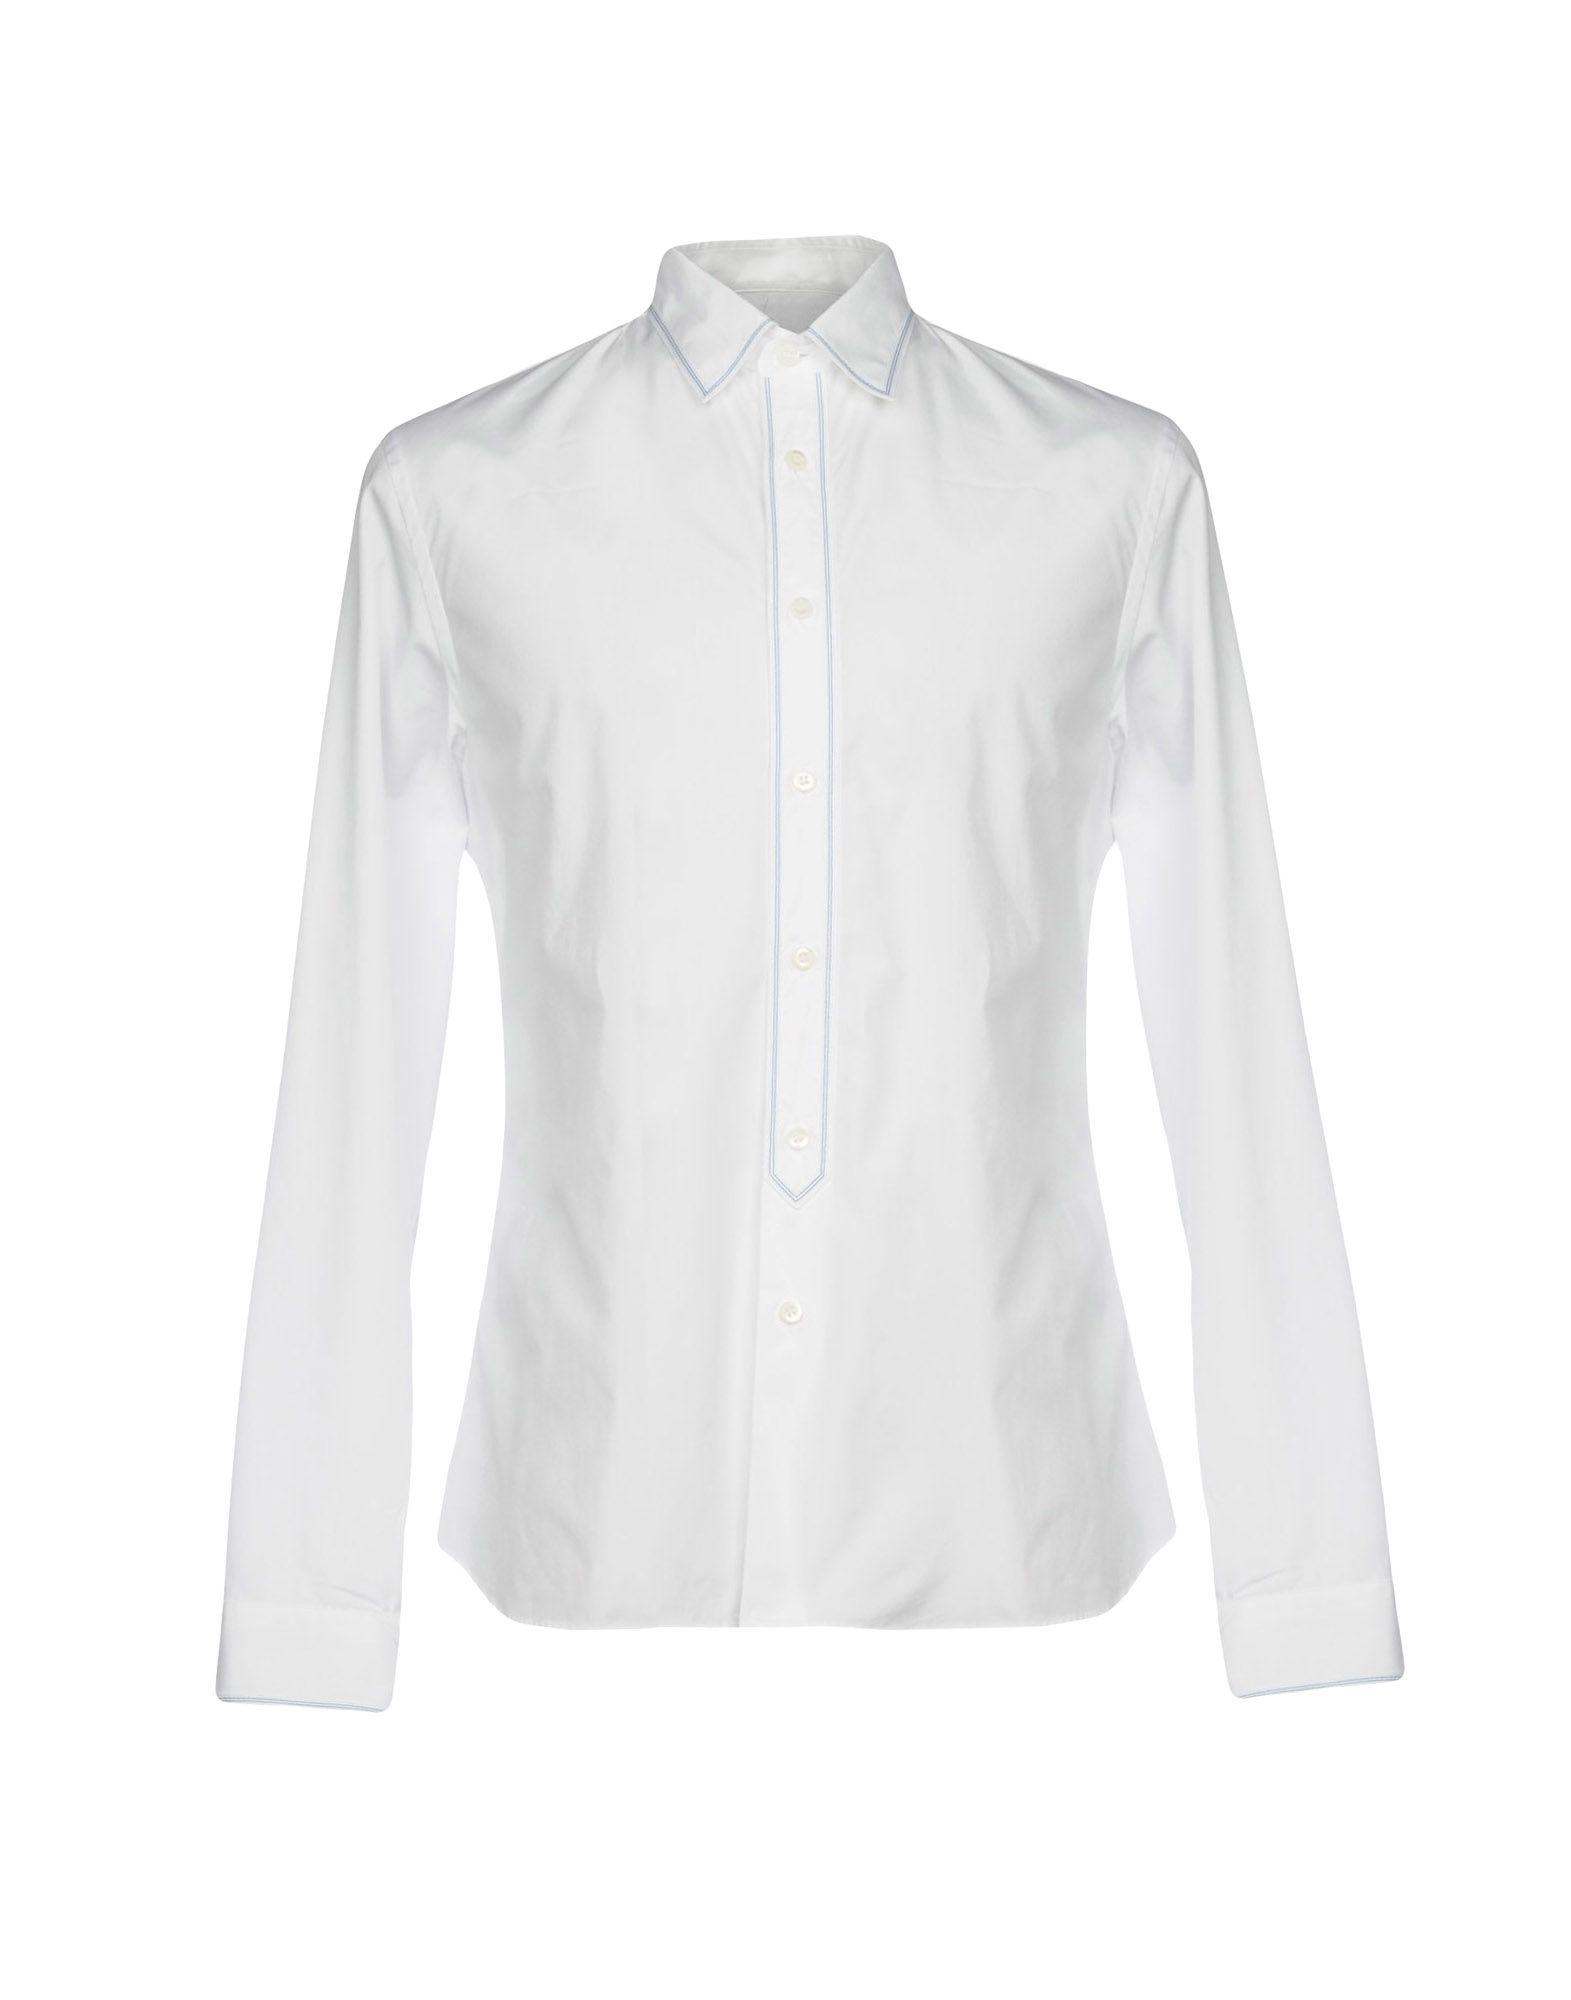 Camicia Tinta Unita Prada Uomo - Acquista online su